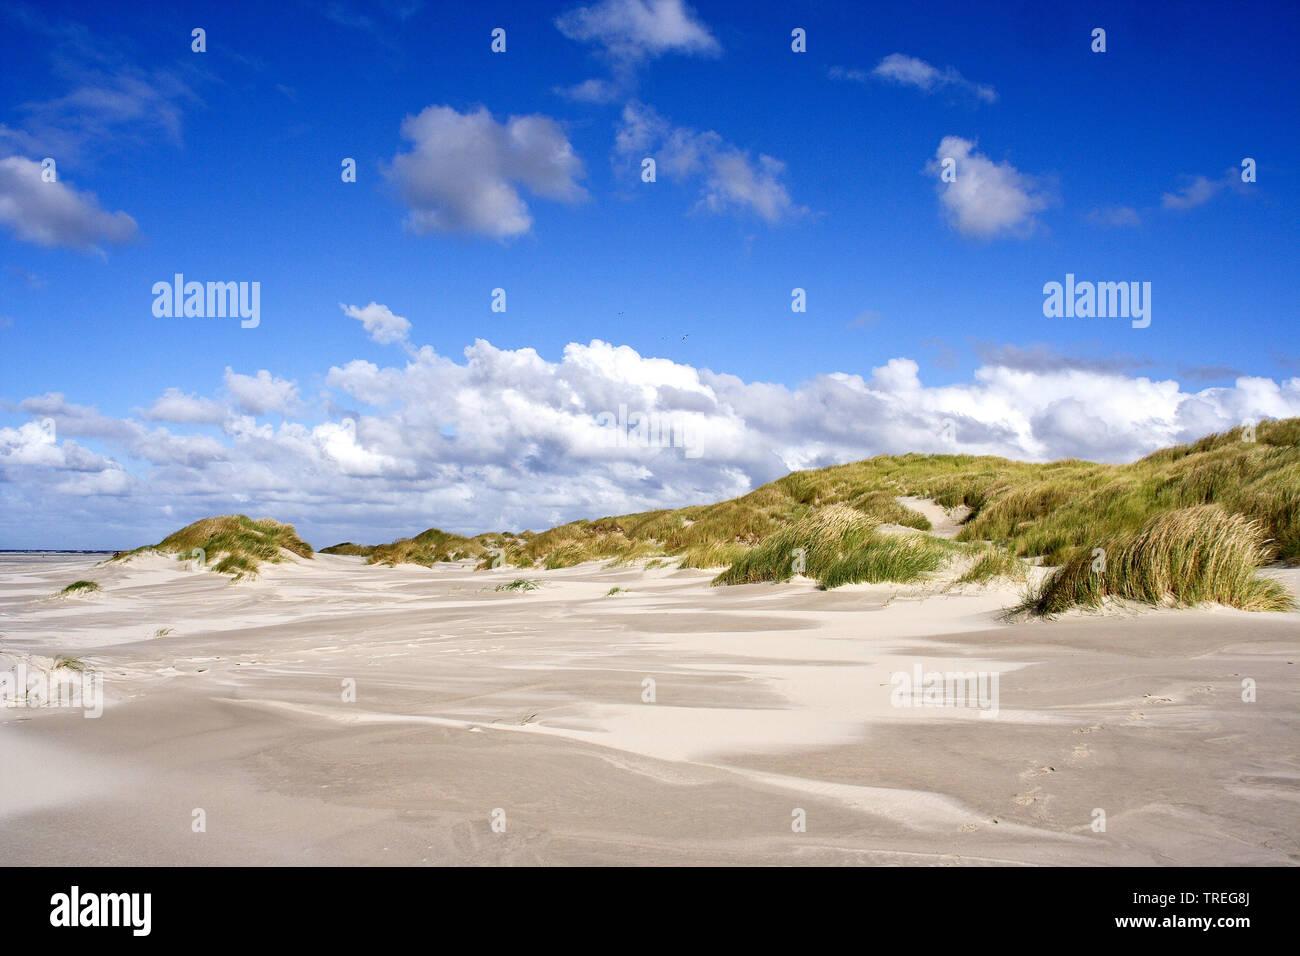 Duenen bei Vliehorst, Niederlande, Friesland, Vlieland | Dunes at de Vliehorst, Netherlands, Frisia, Vlieland | BLWS525900.jpg [ (c) blickwinkel/AGAMI - Stock Image